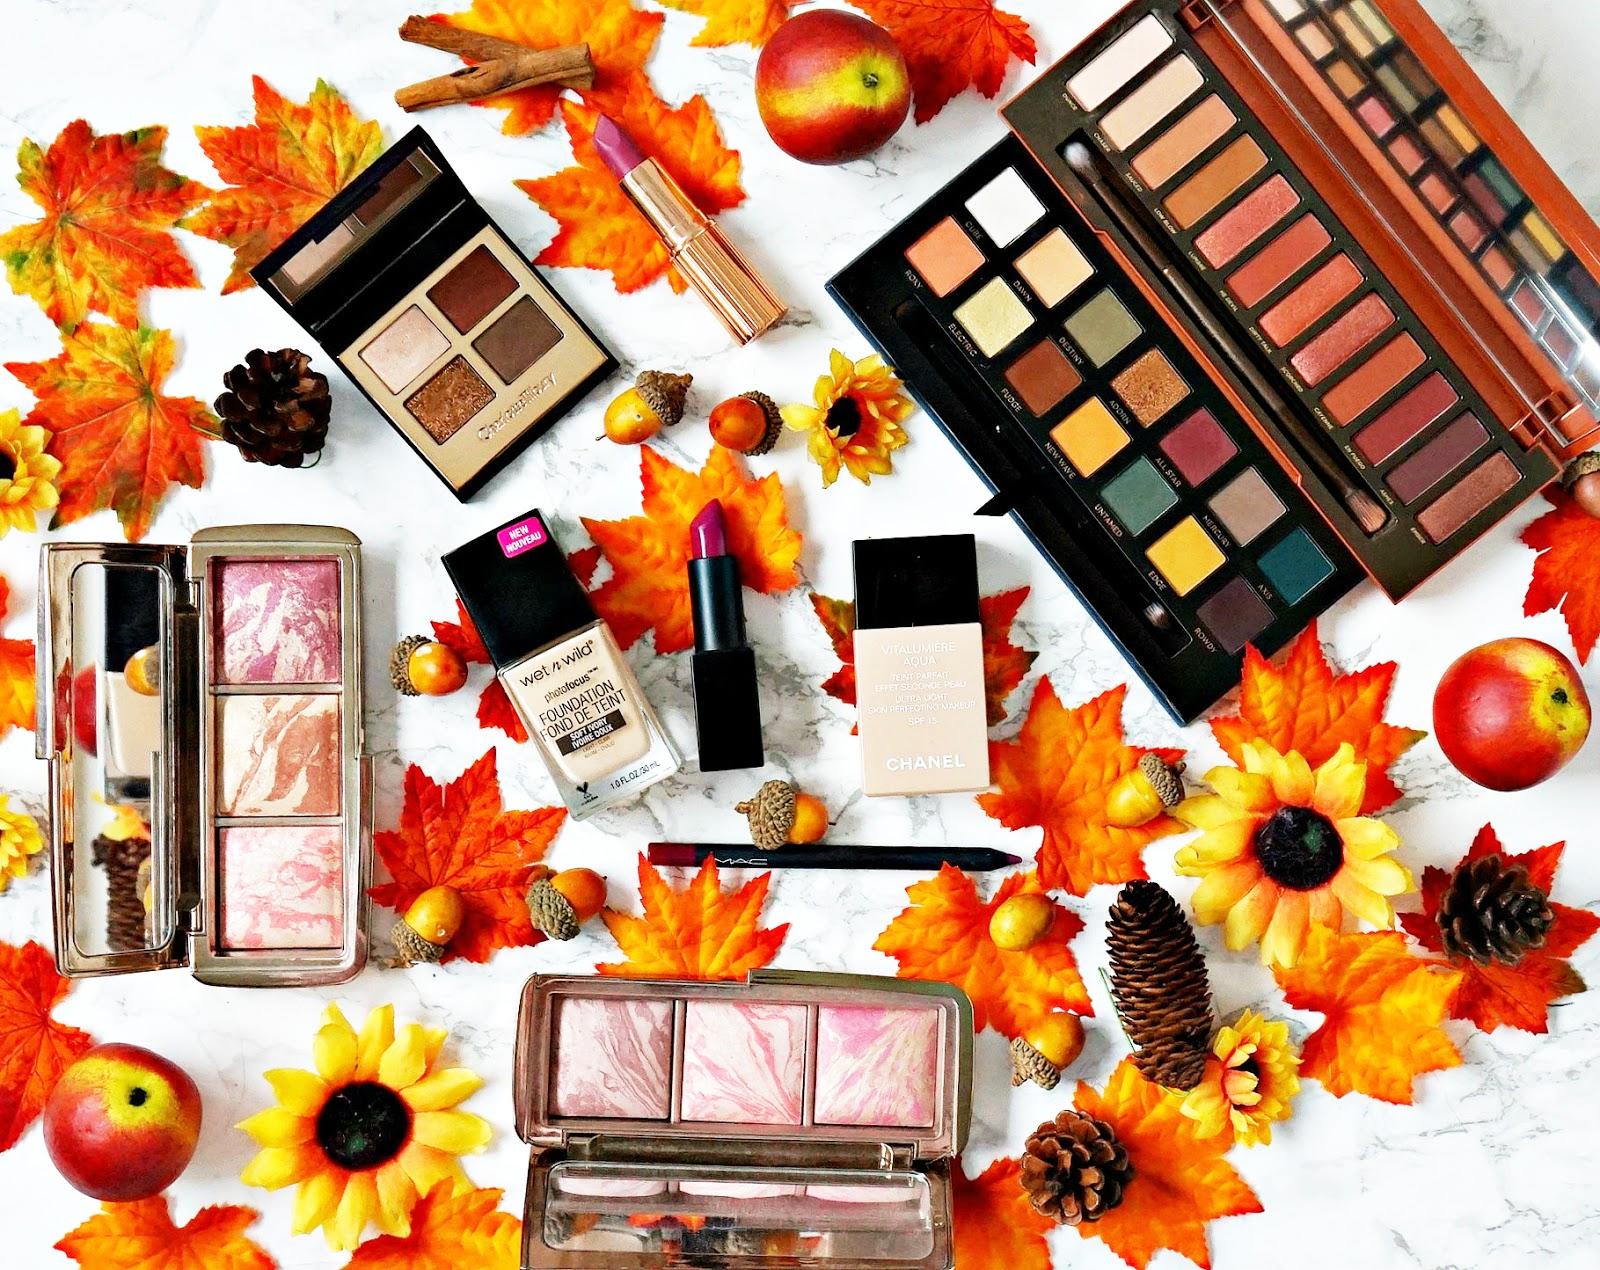 Autumn, Chanel, Charlotte Tilbury, Dolce Vita, MAC, Naked Heat Palette, Nars Audacious, Rebellious, Urban Decay, vitalumiere aqua, Wet N Wild,